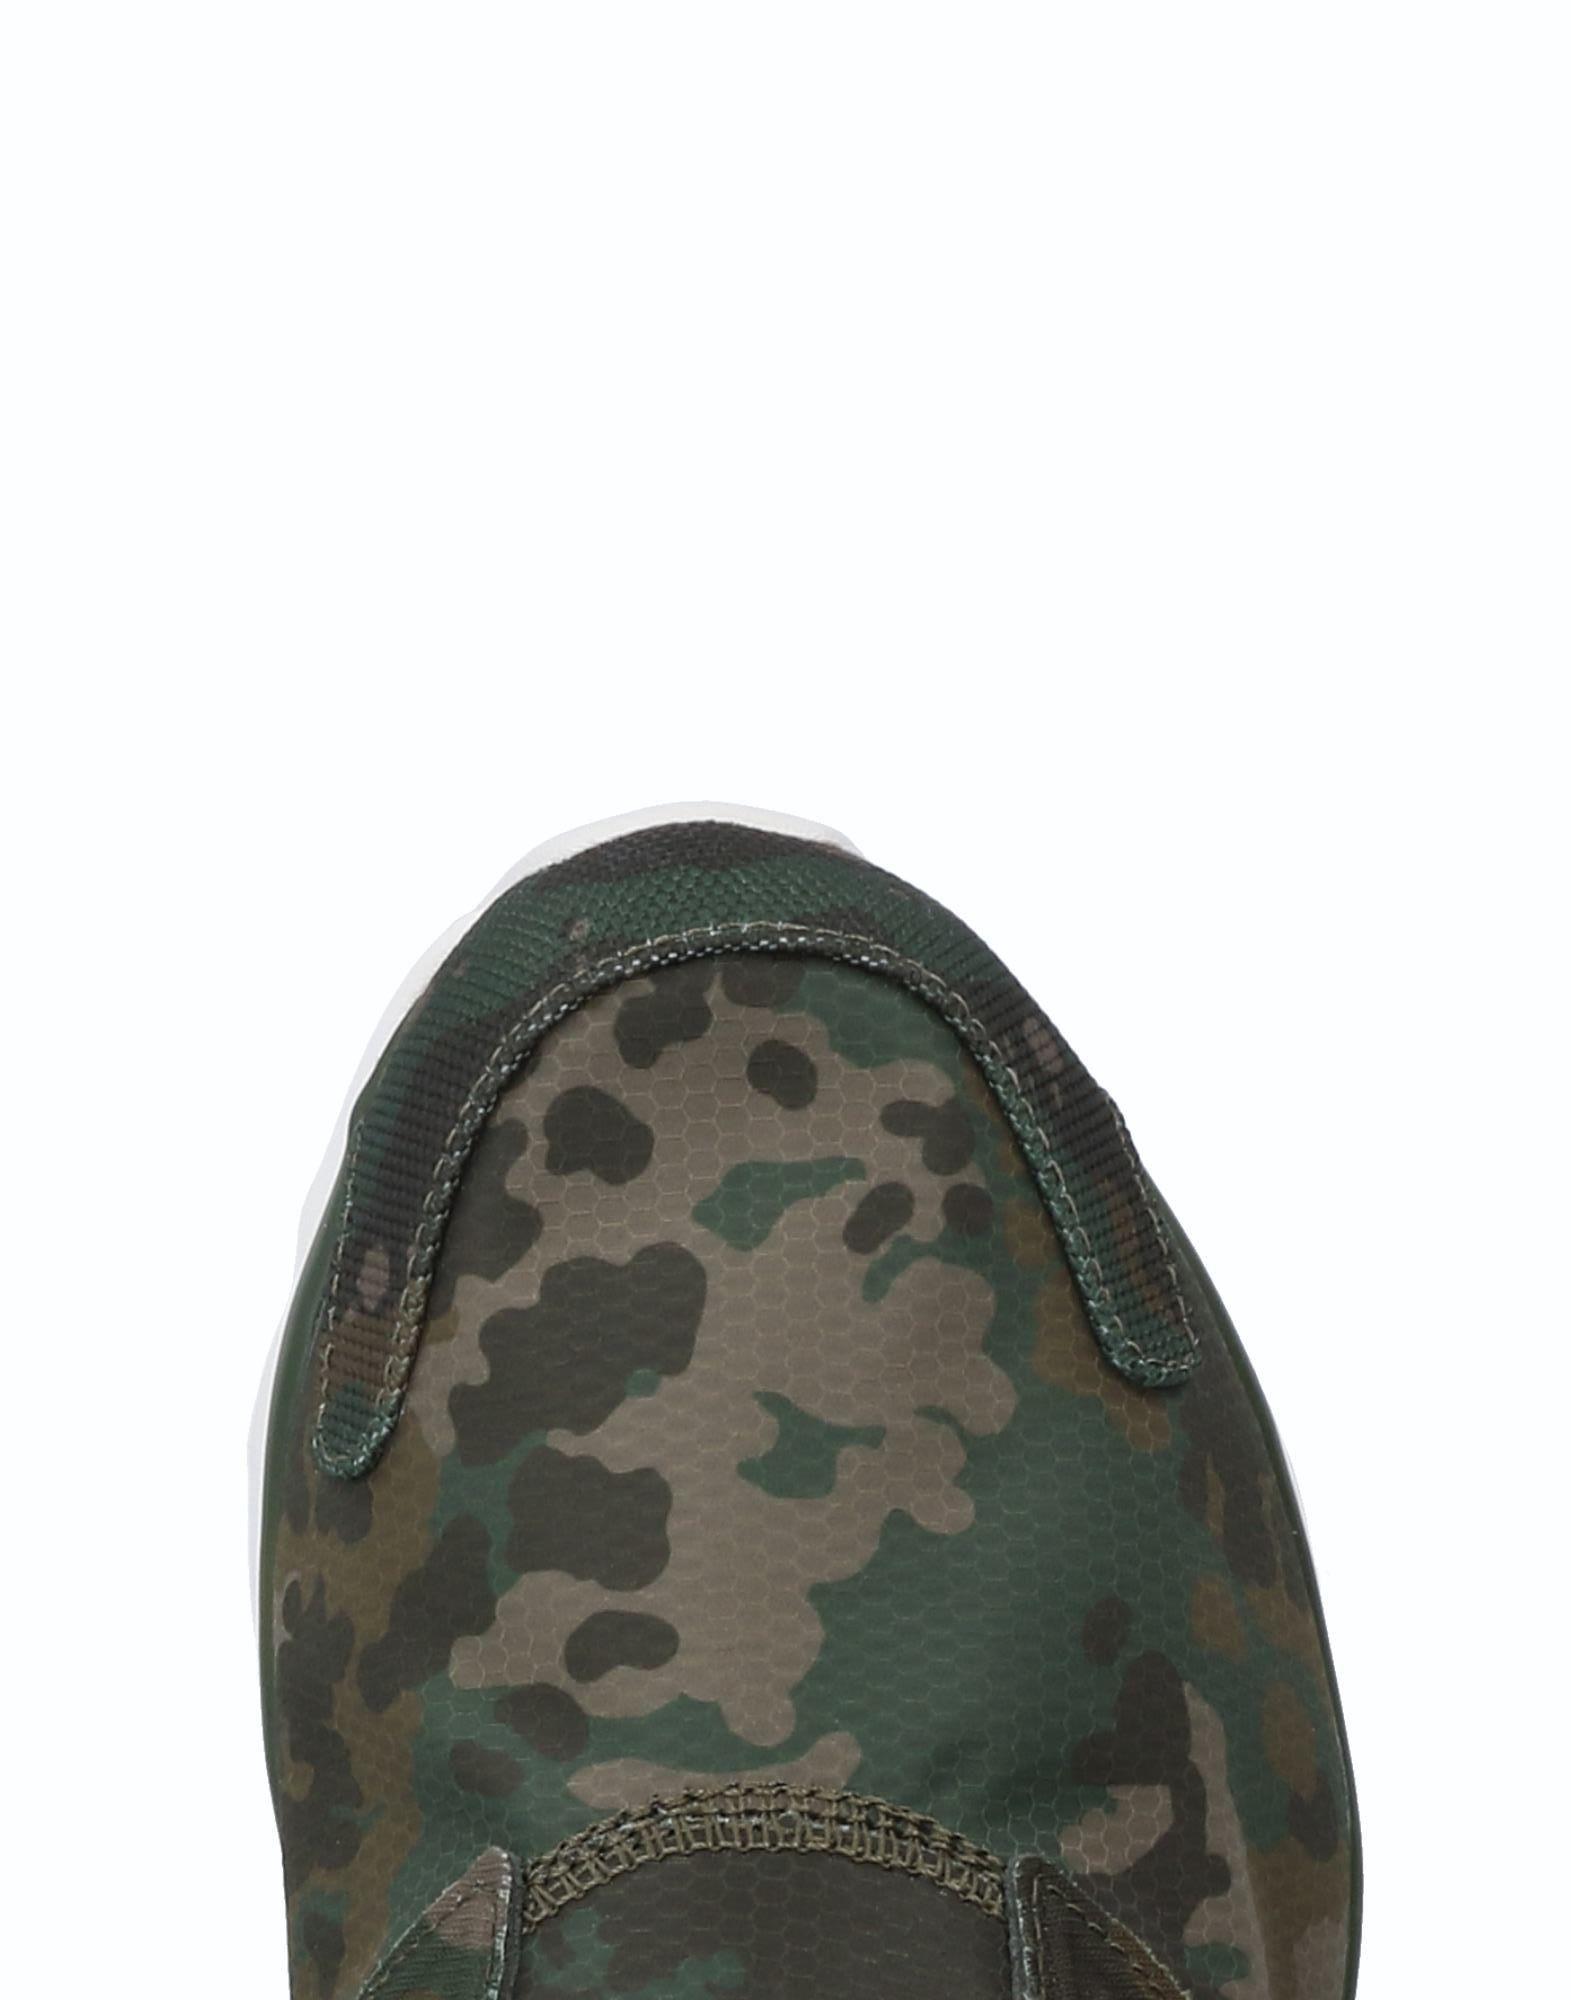 11505260UT Reebok Sneakers Herren  11505260UT  Heiße Schuhe 820e4c